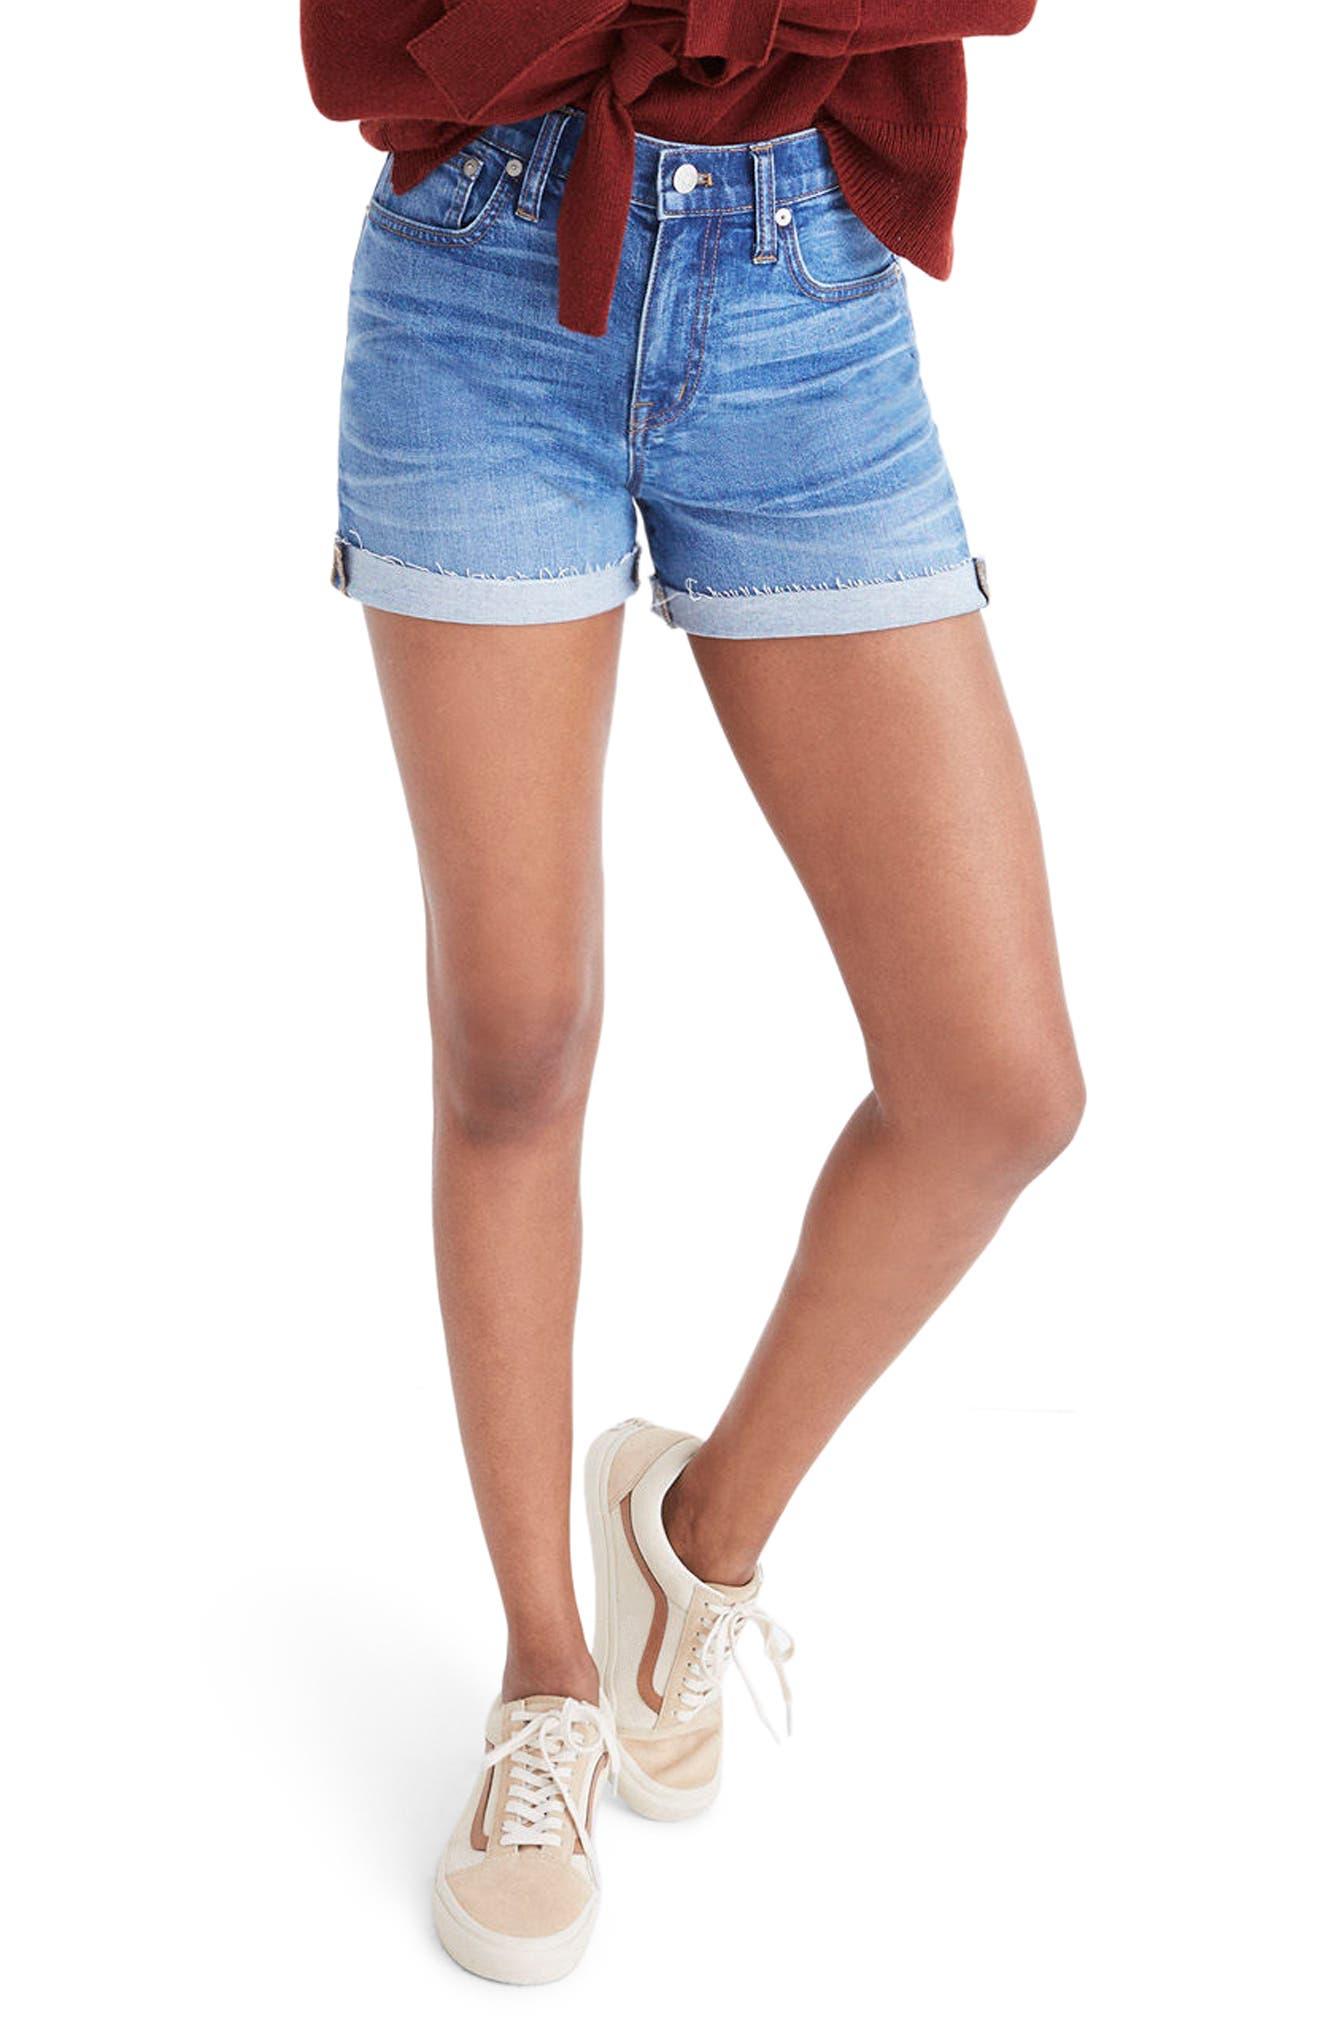 Madewell High Rise Denim Shorts (Maloney)